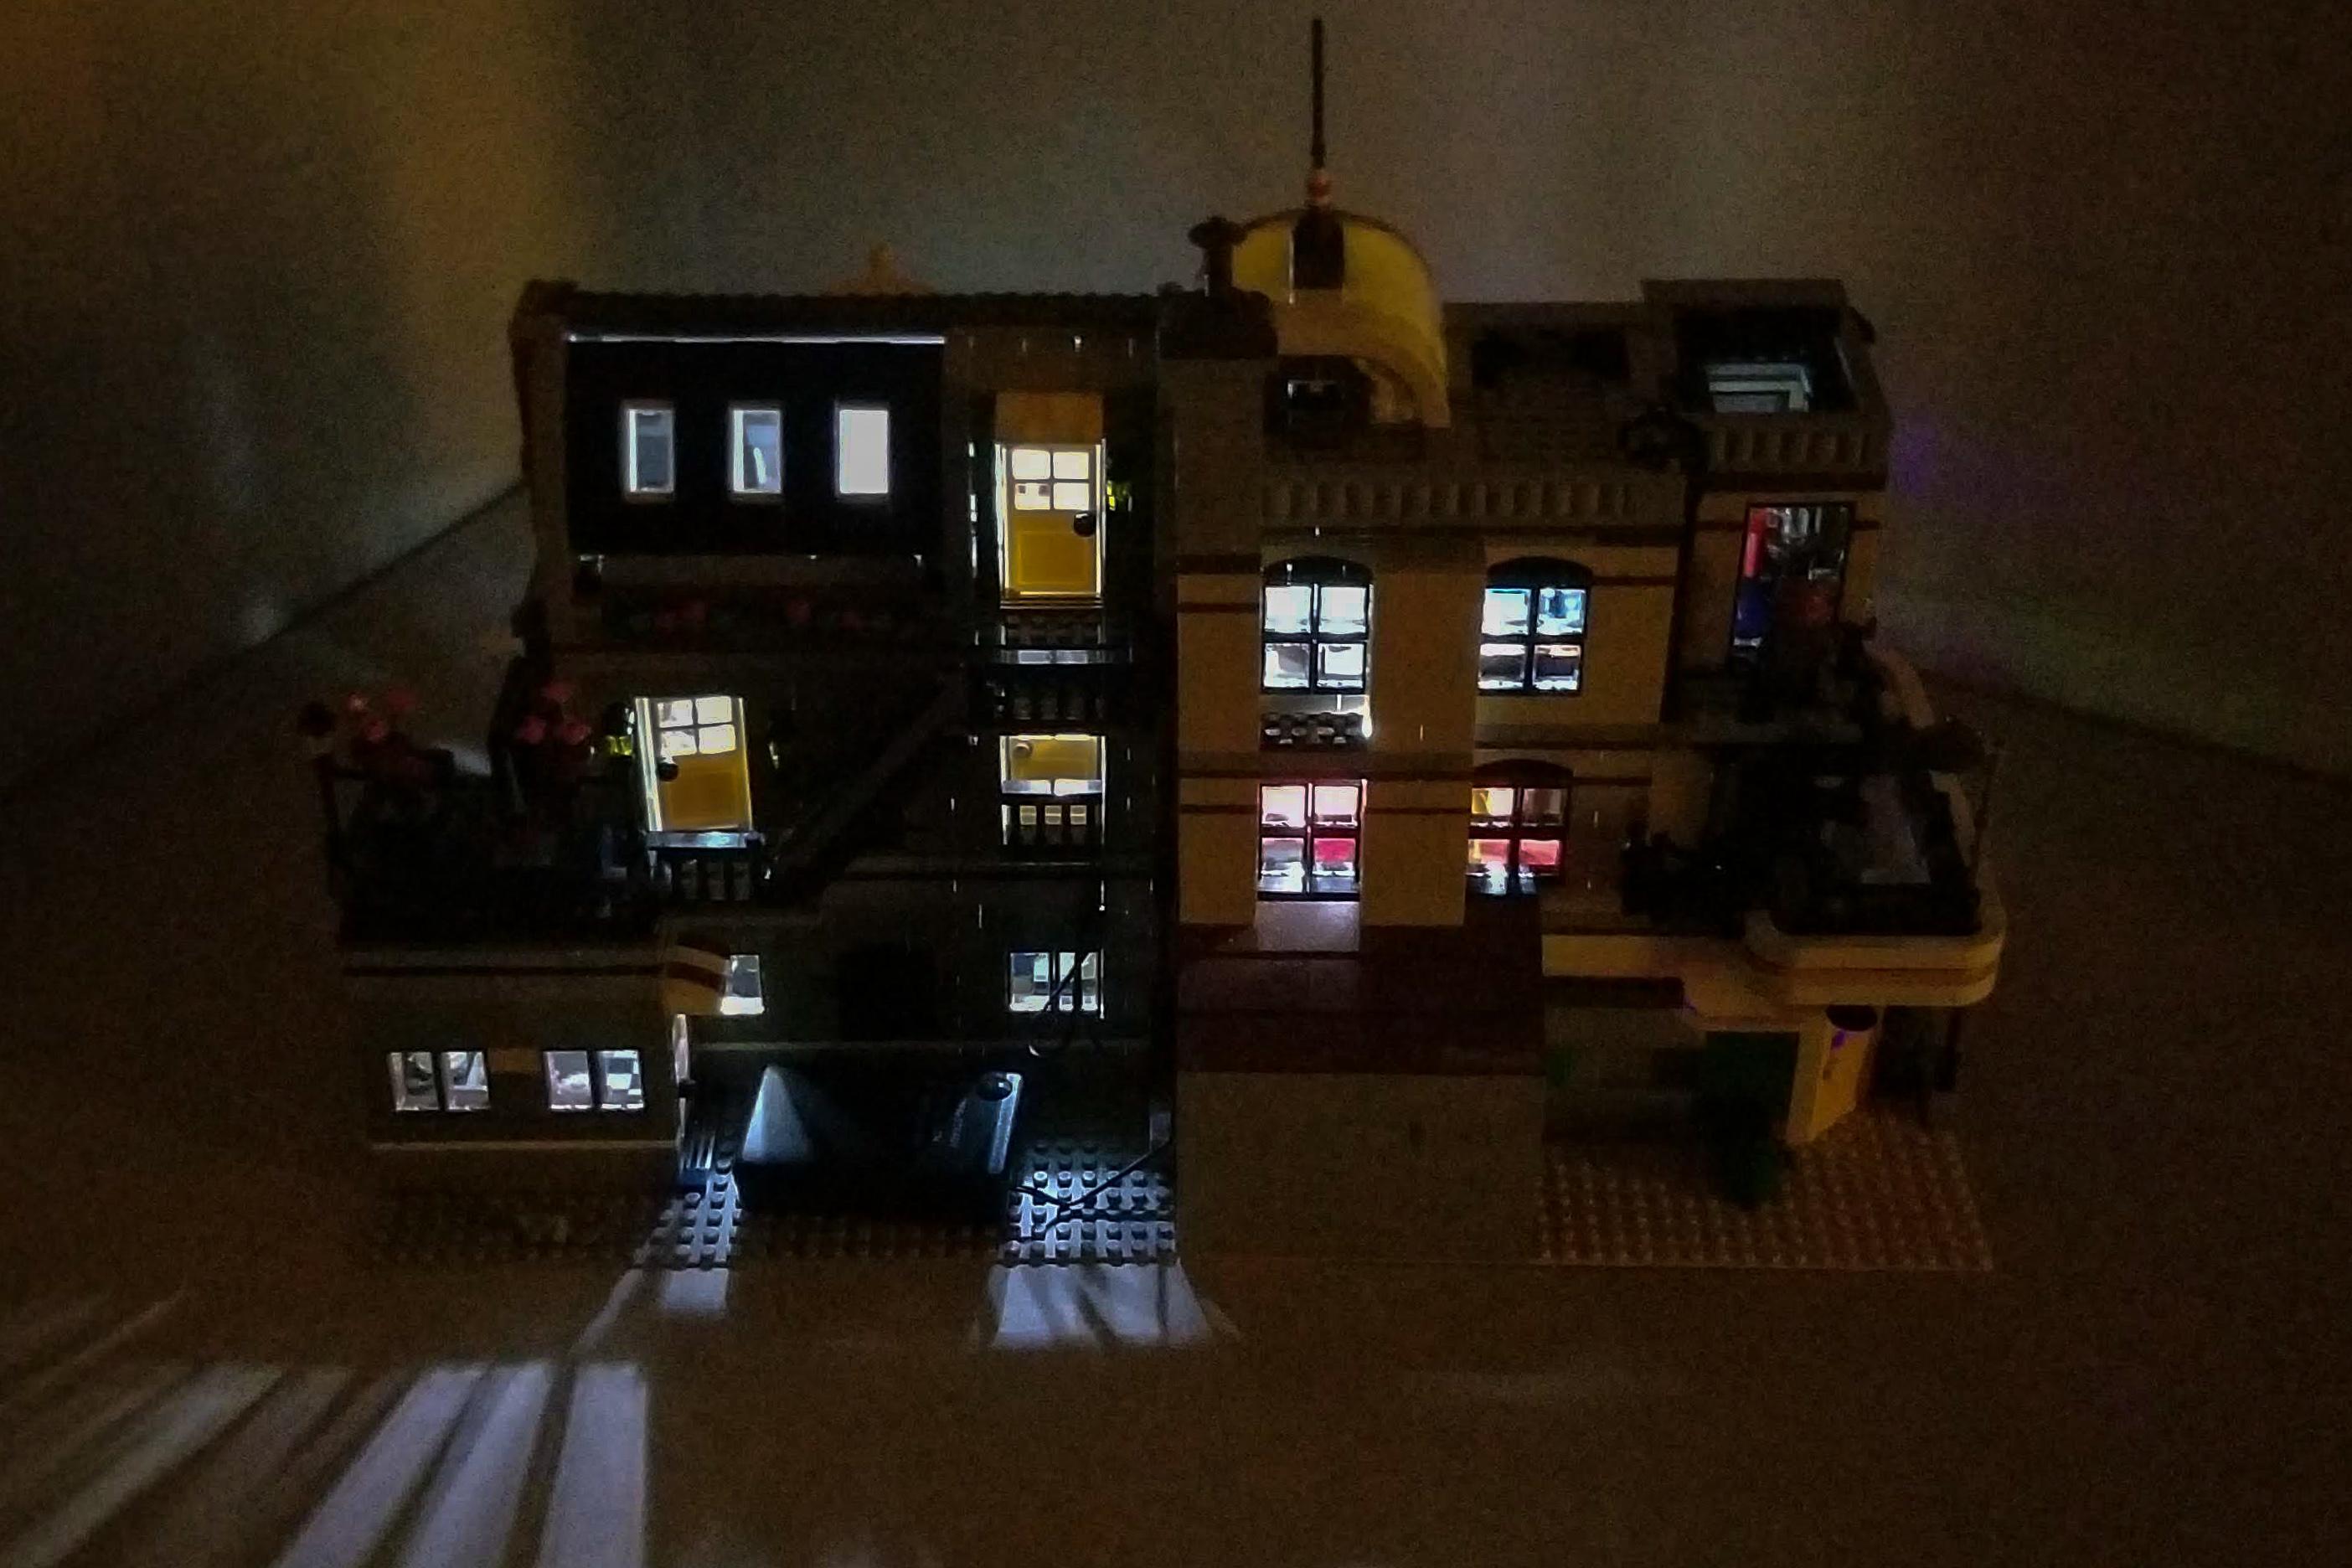 ʀᴇᴠɪᴇᴡ Battery Powered Led Christmas Lights Brick Architect